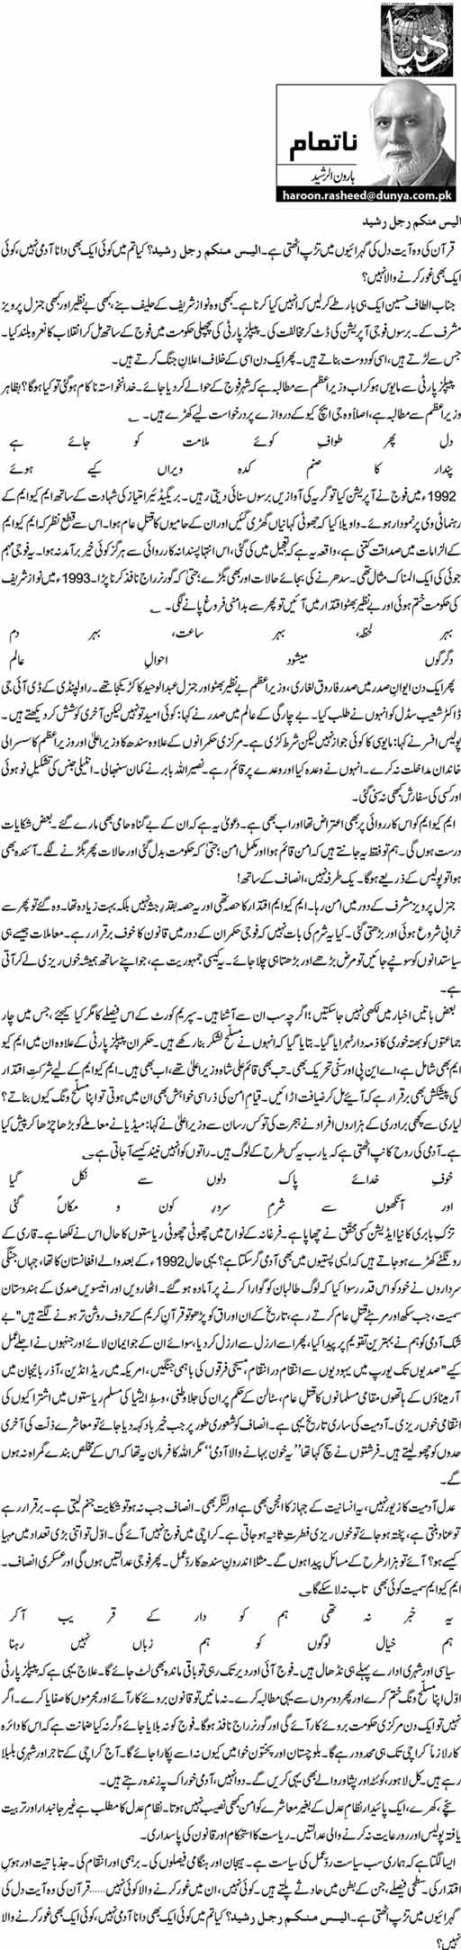 Alais Minkum Rajul Rasheed - Haroon ur Rasheed